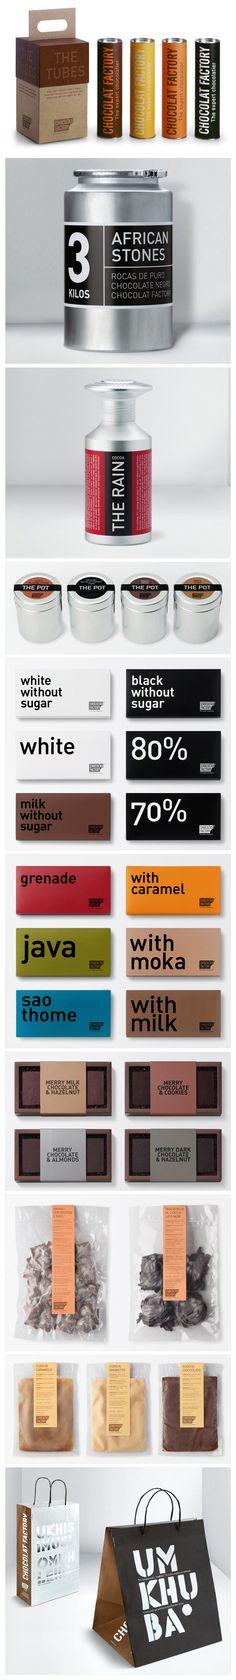 chocolat factory packaging. design credit, ruiz+company.